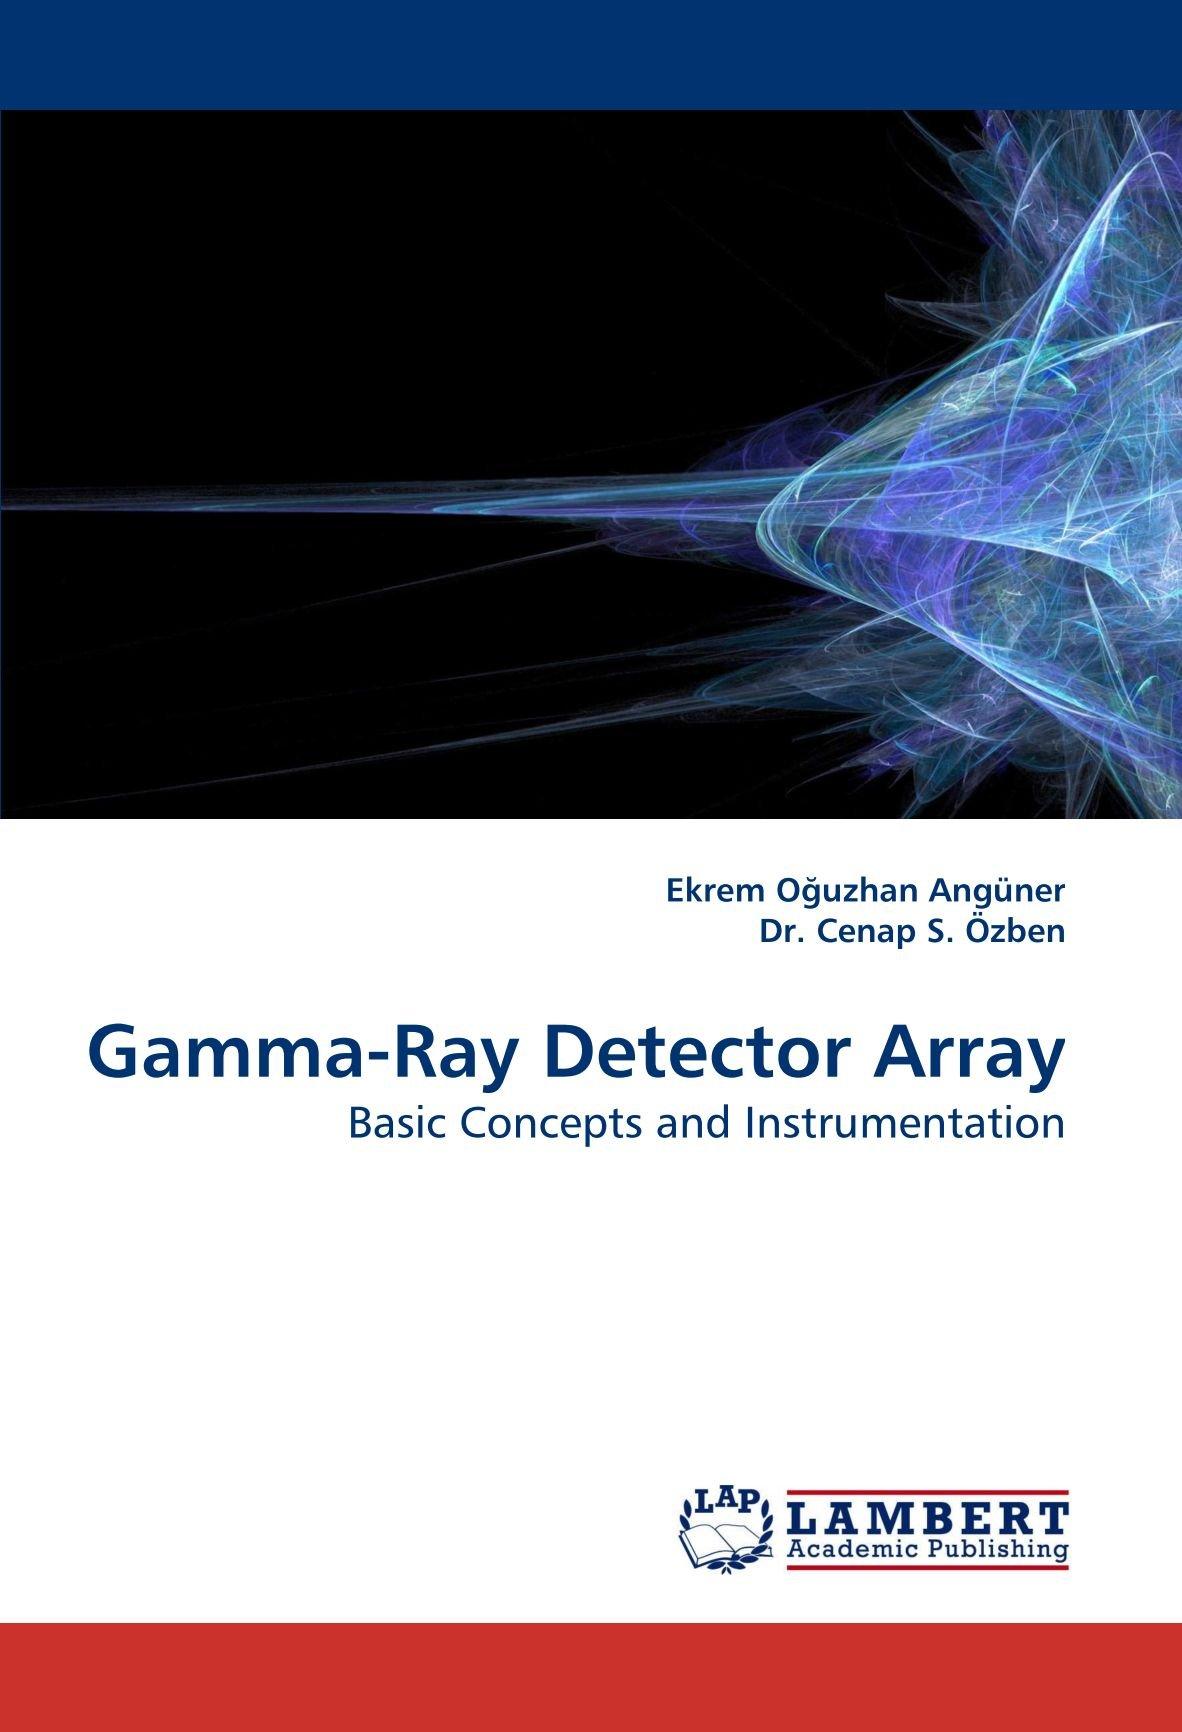 Gamma-Ray Detector Array: Basic Concepts and Instrumentation: Amazon.es: Ekrem Oguzhan Angüner: Libros en idiomas extranjeros